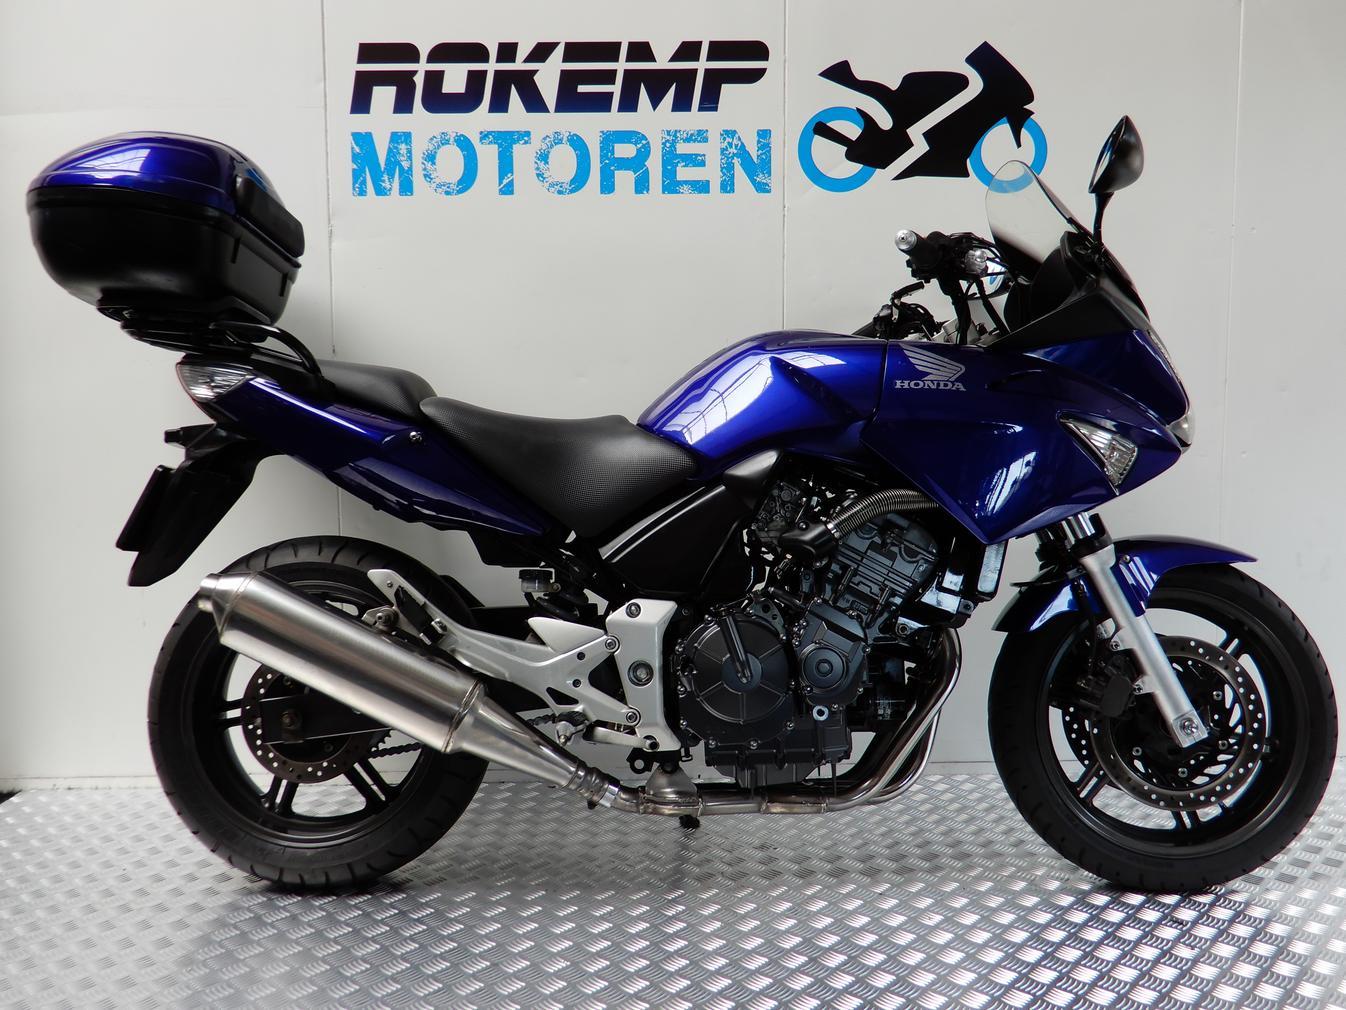 Review motor: HONDA CBF 600 - BikeNet